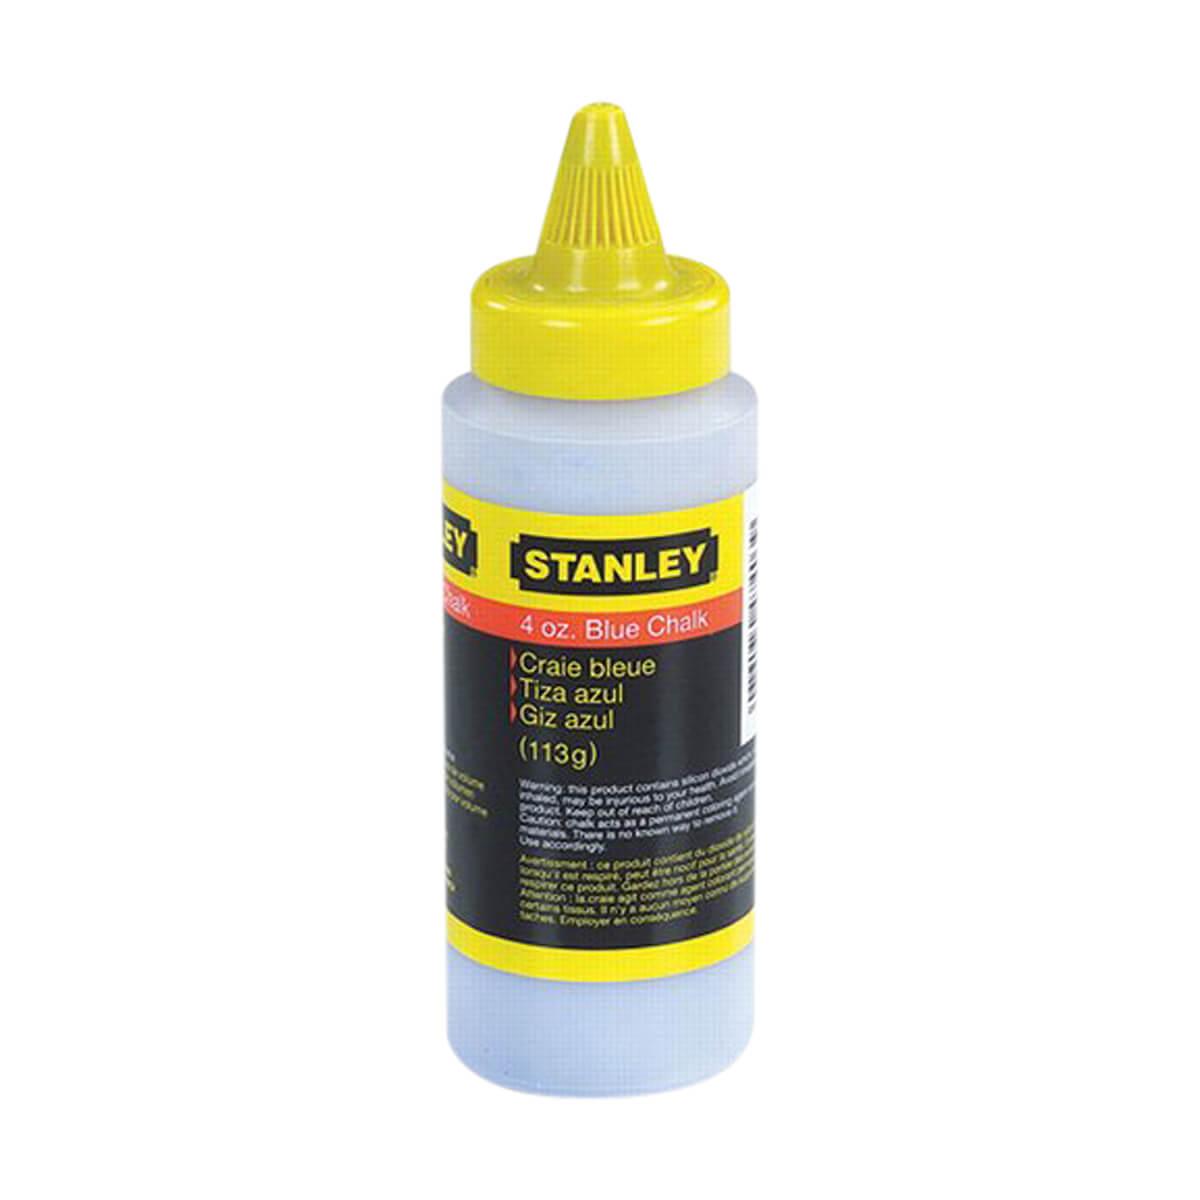 Stanley 8oz. Chalk Refill - Blue